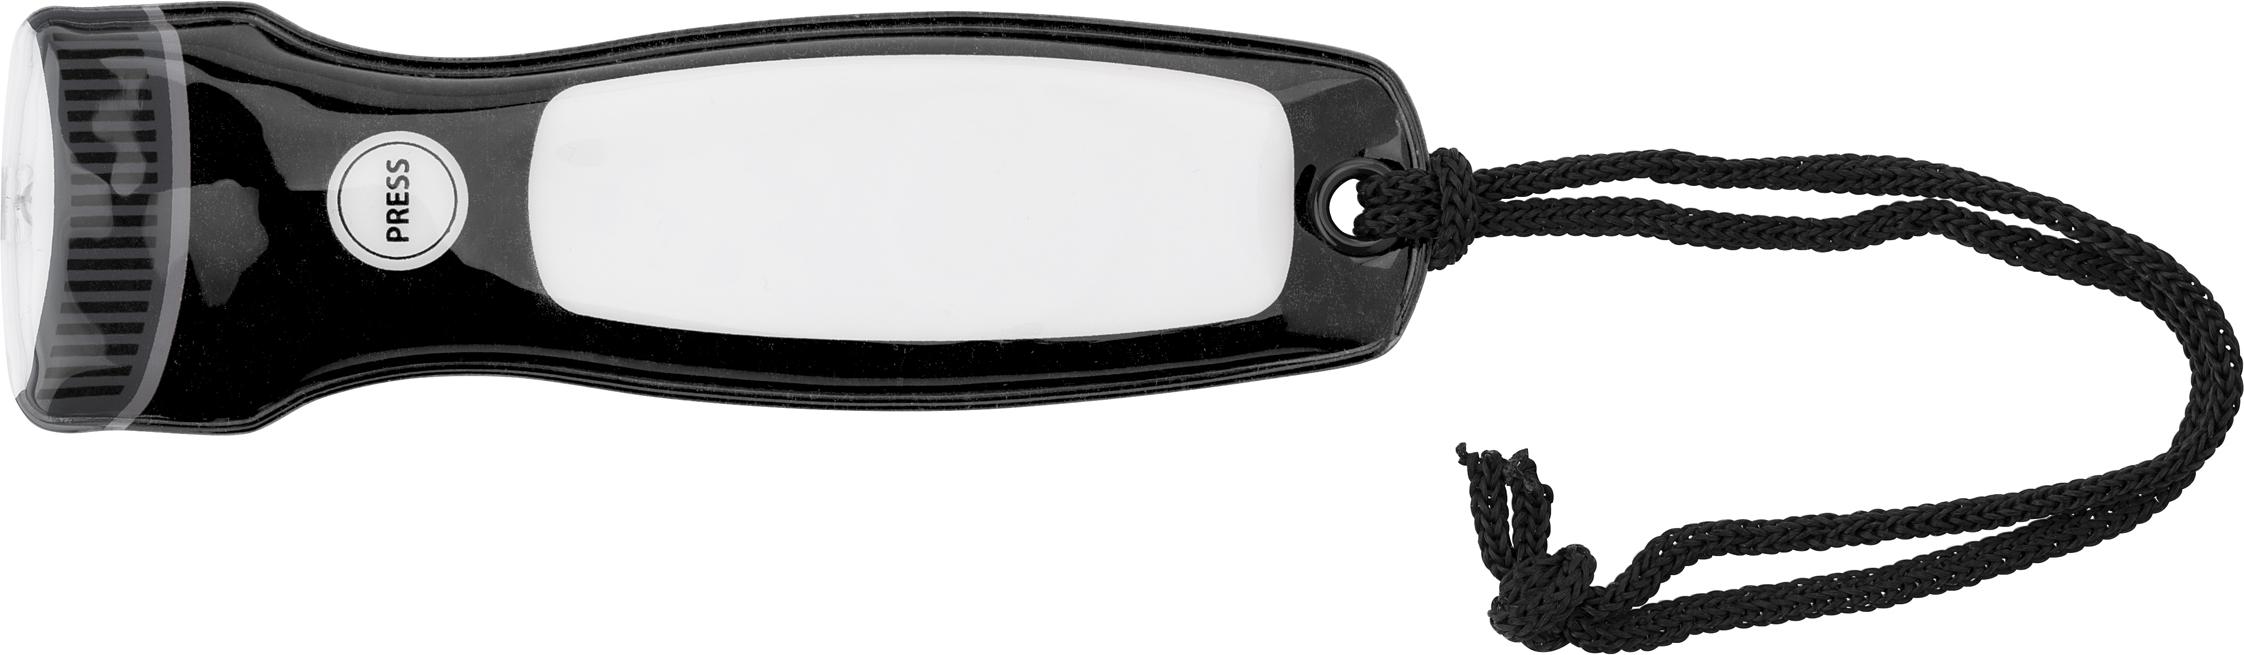 LED-Taschenlampe ´Floren ...